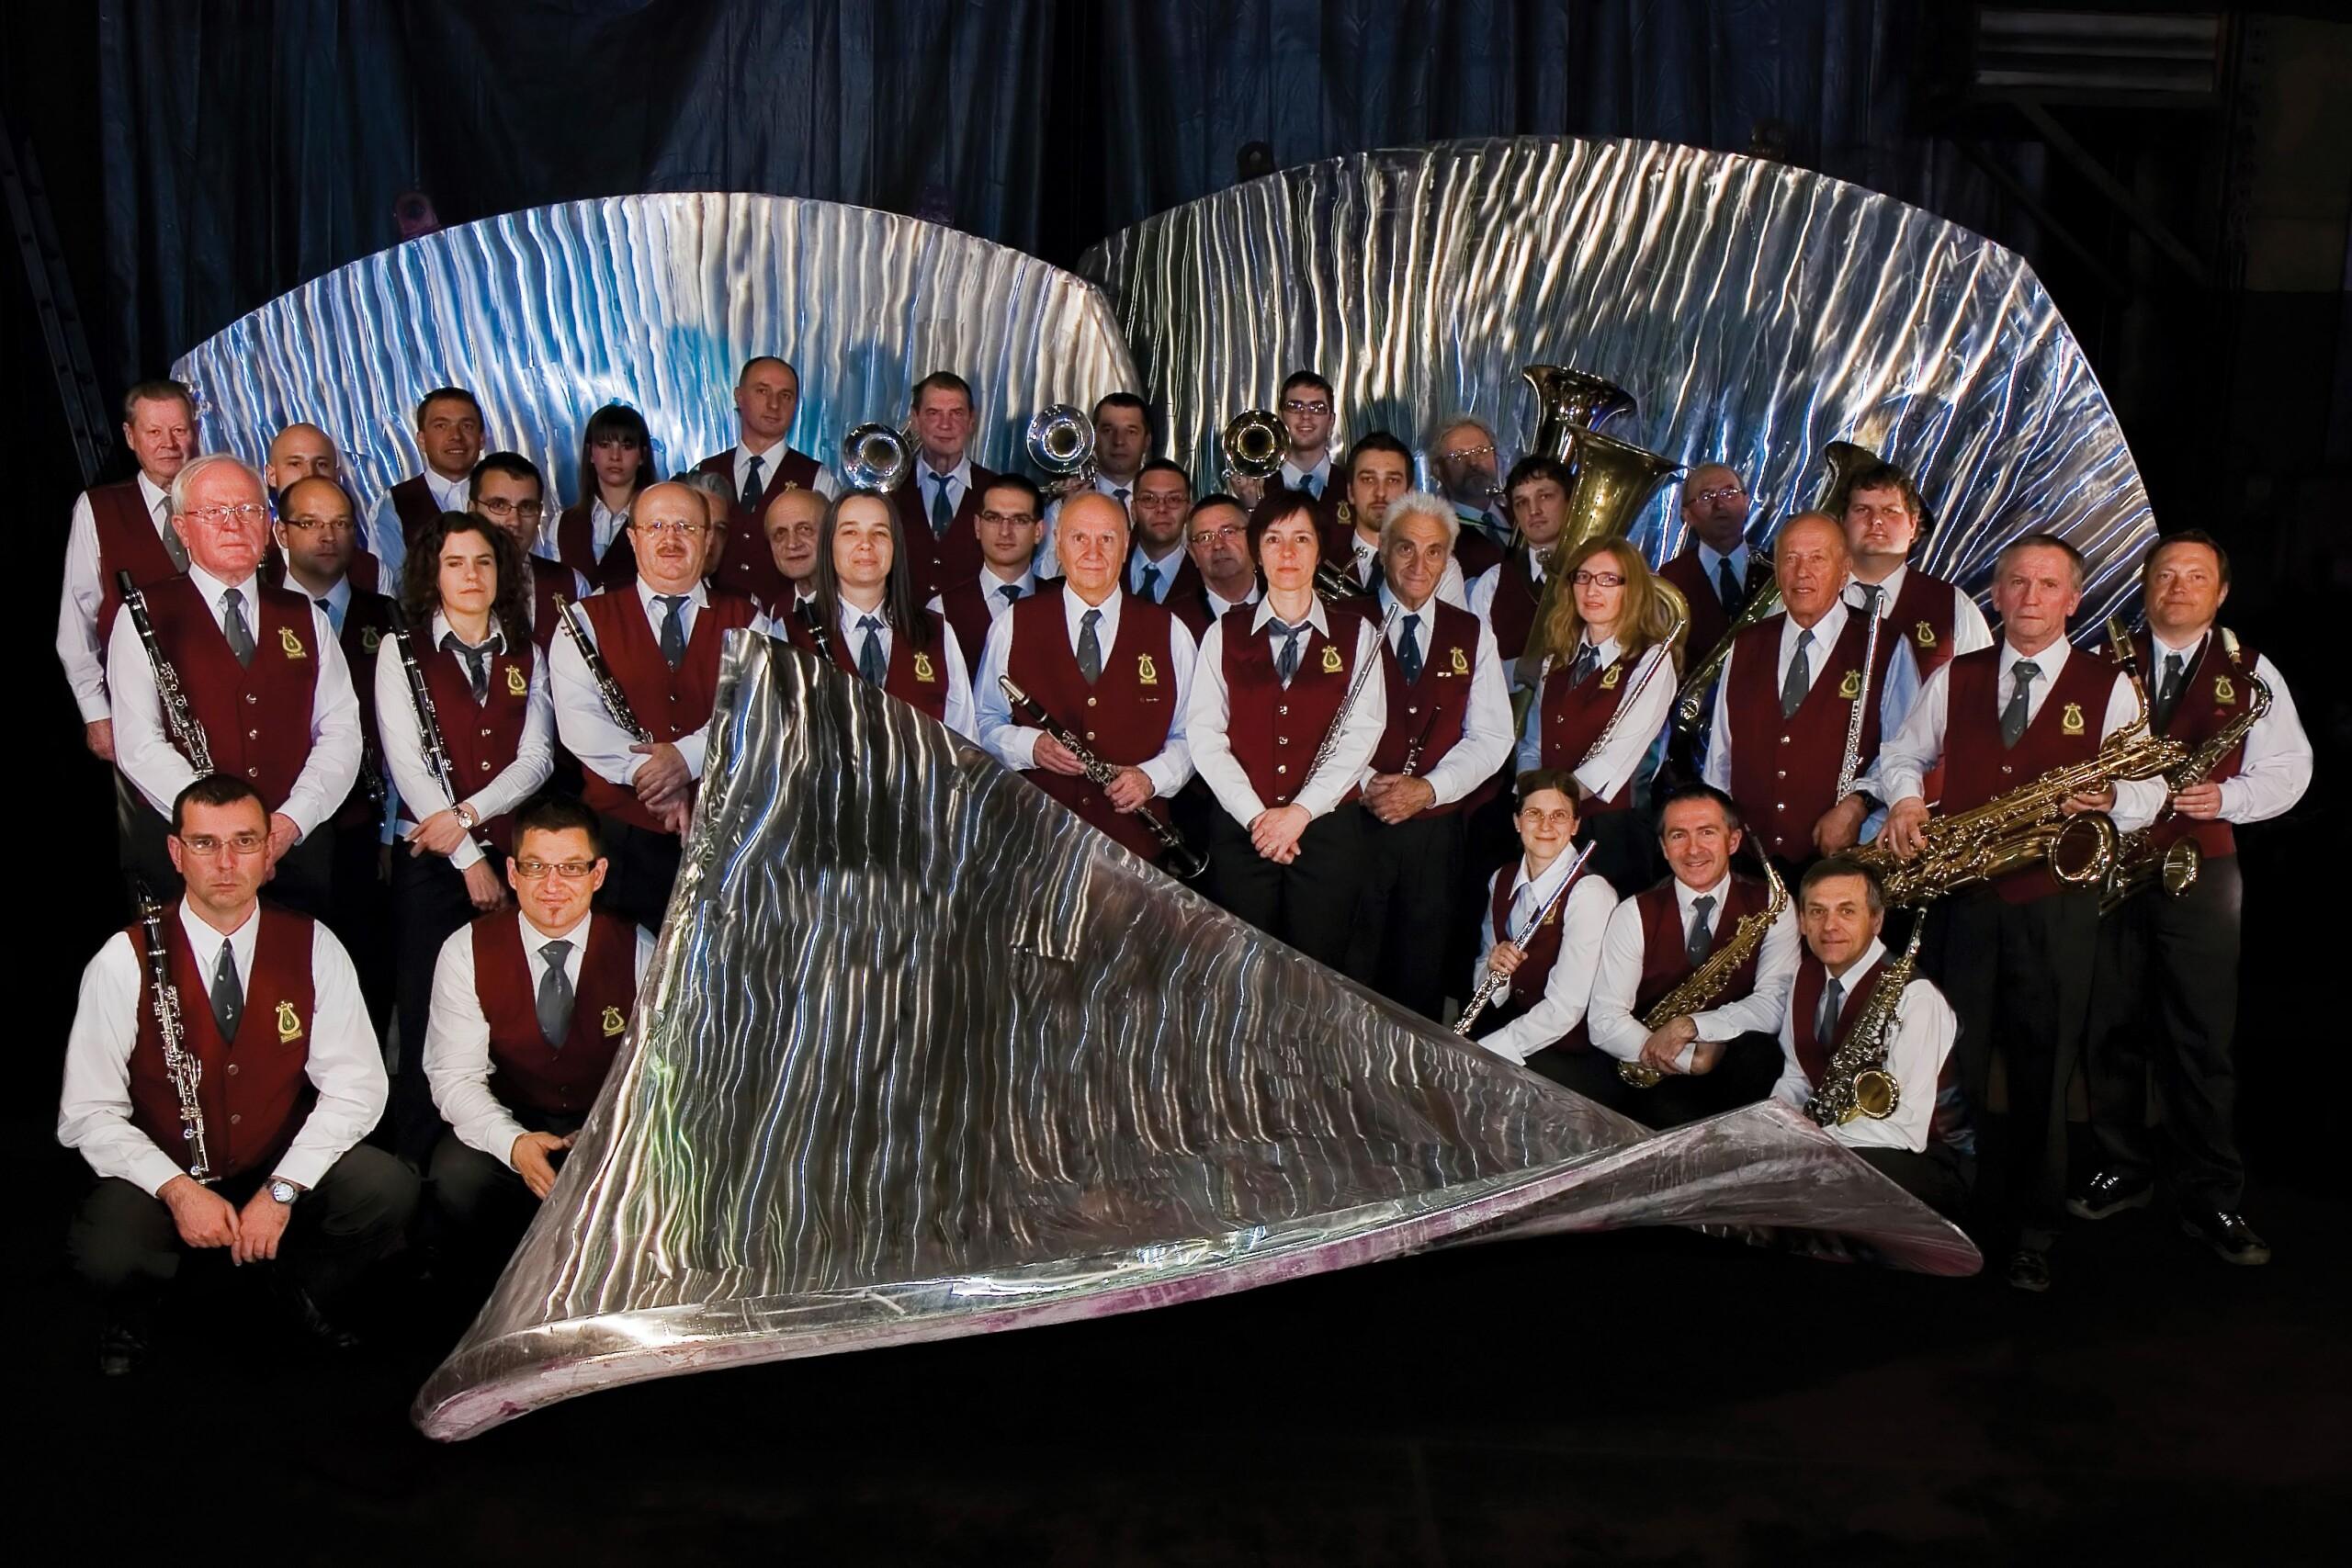 Pihalni orkester Litostroj leta 2010